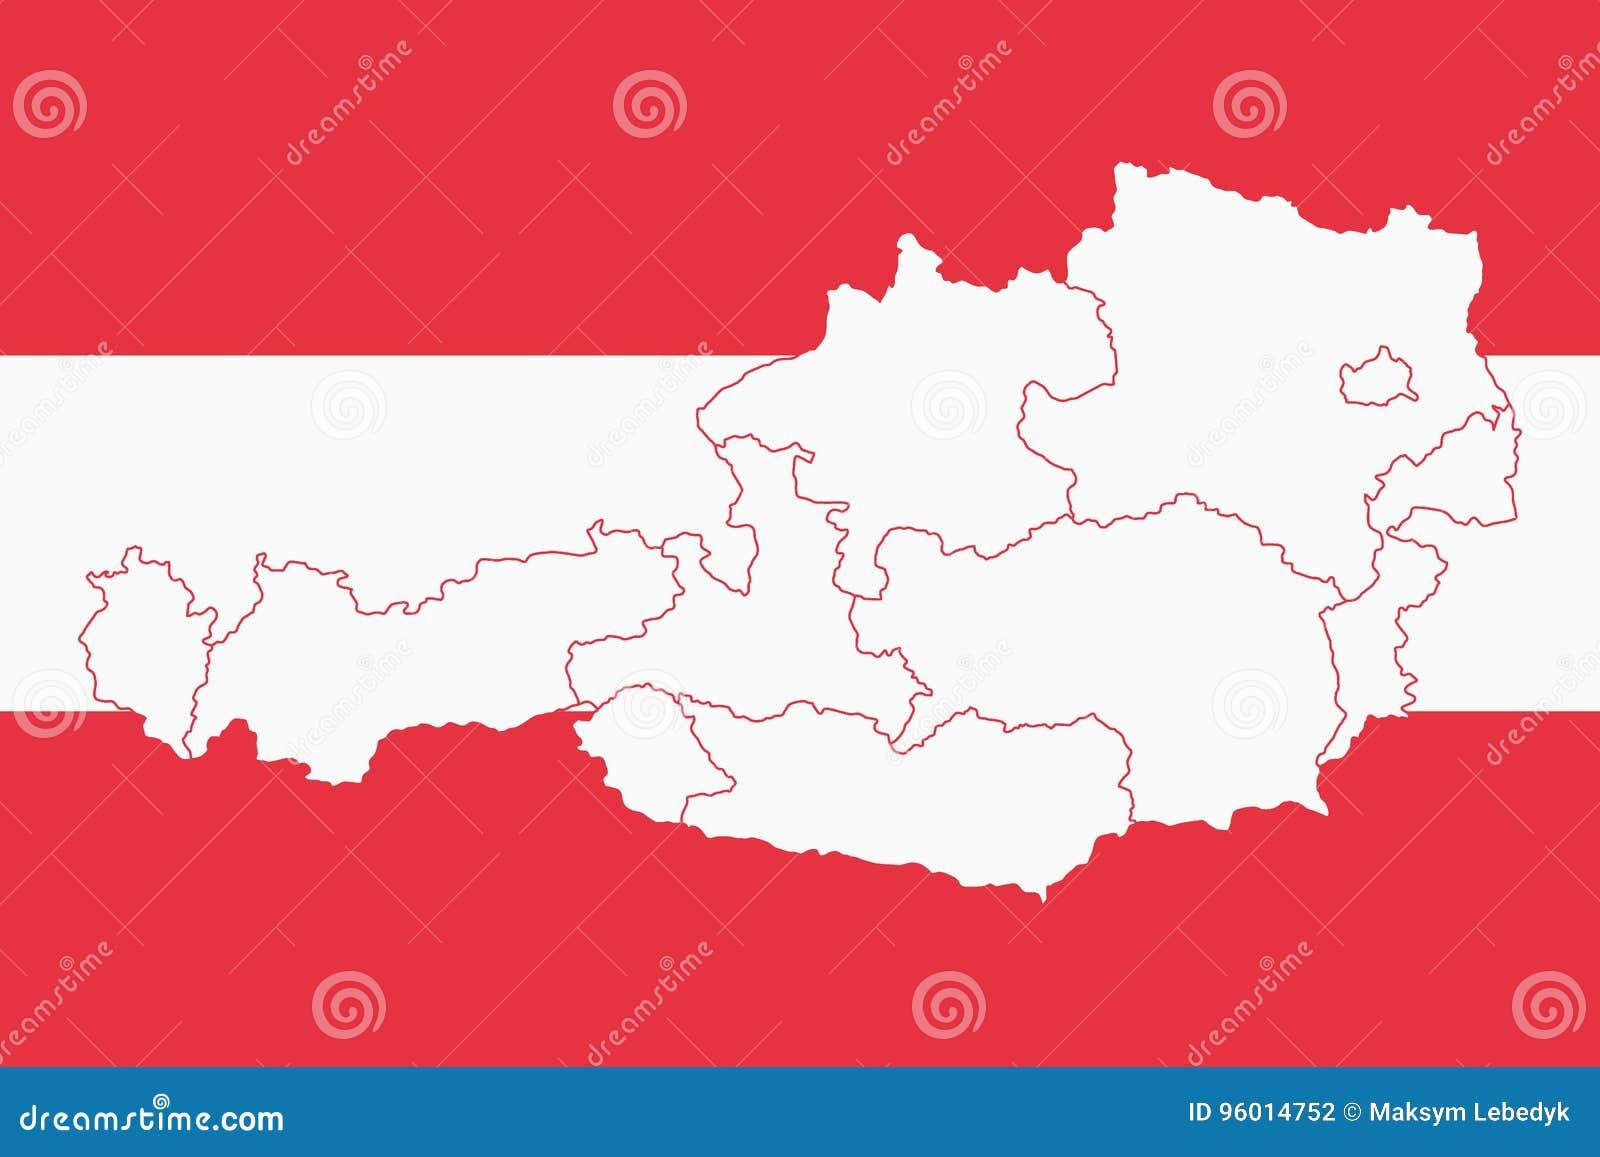 Vector Illustration Of Austria Flag Map Stock Vector ...